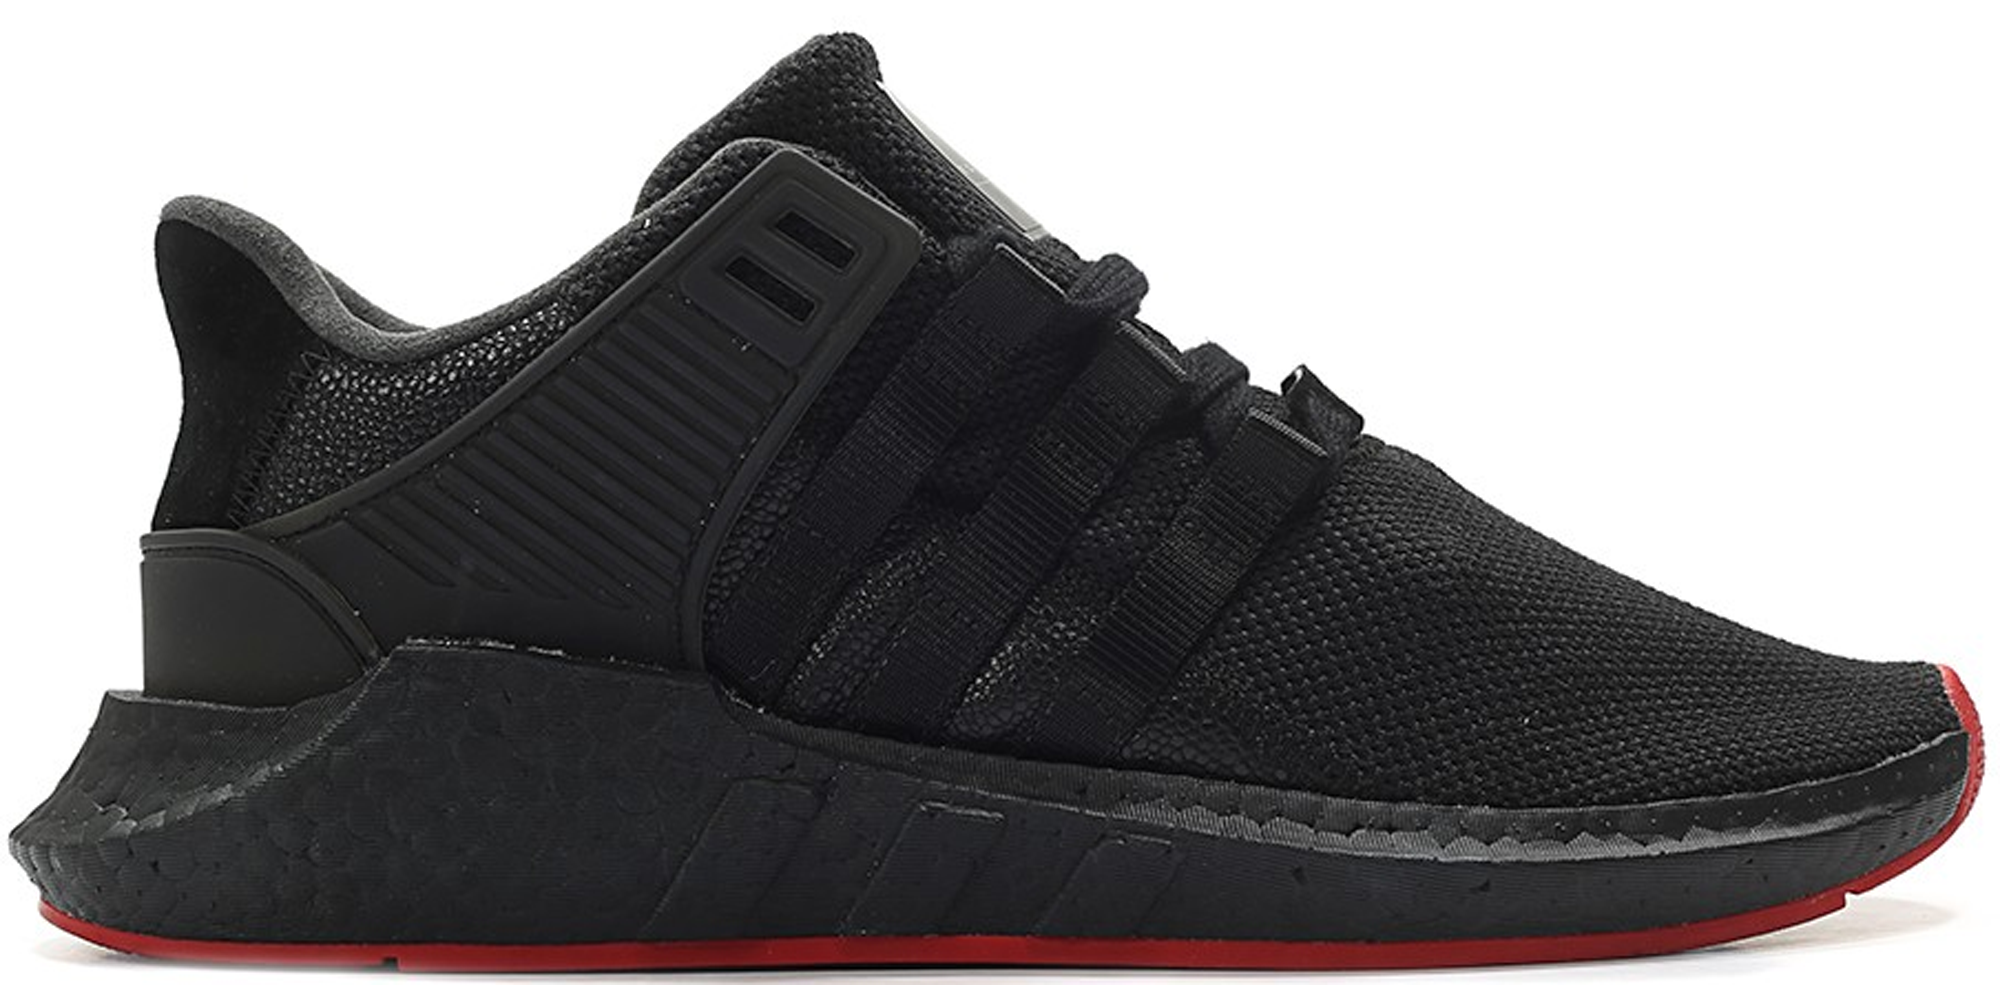 online retailer 1380e 15bca ... france adidas eqt support 93 17 red carpet pack black 200f2 1a6ff